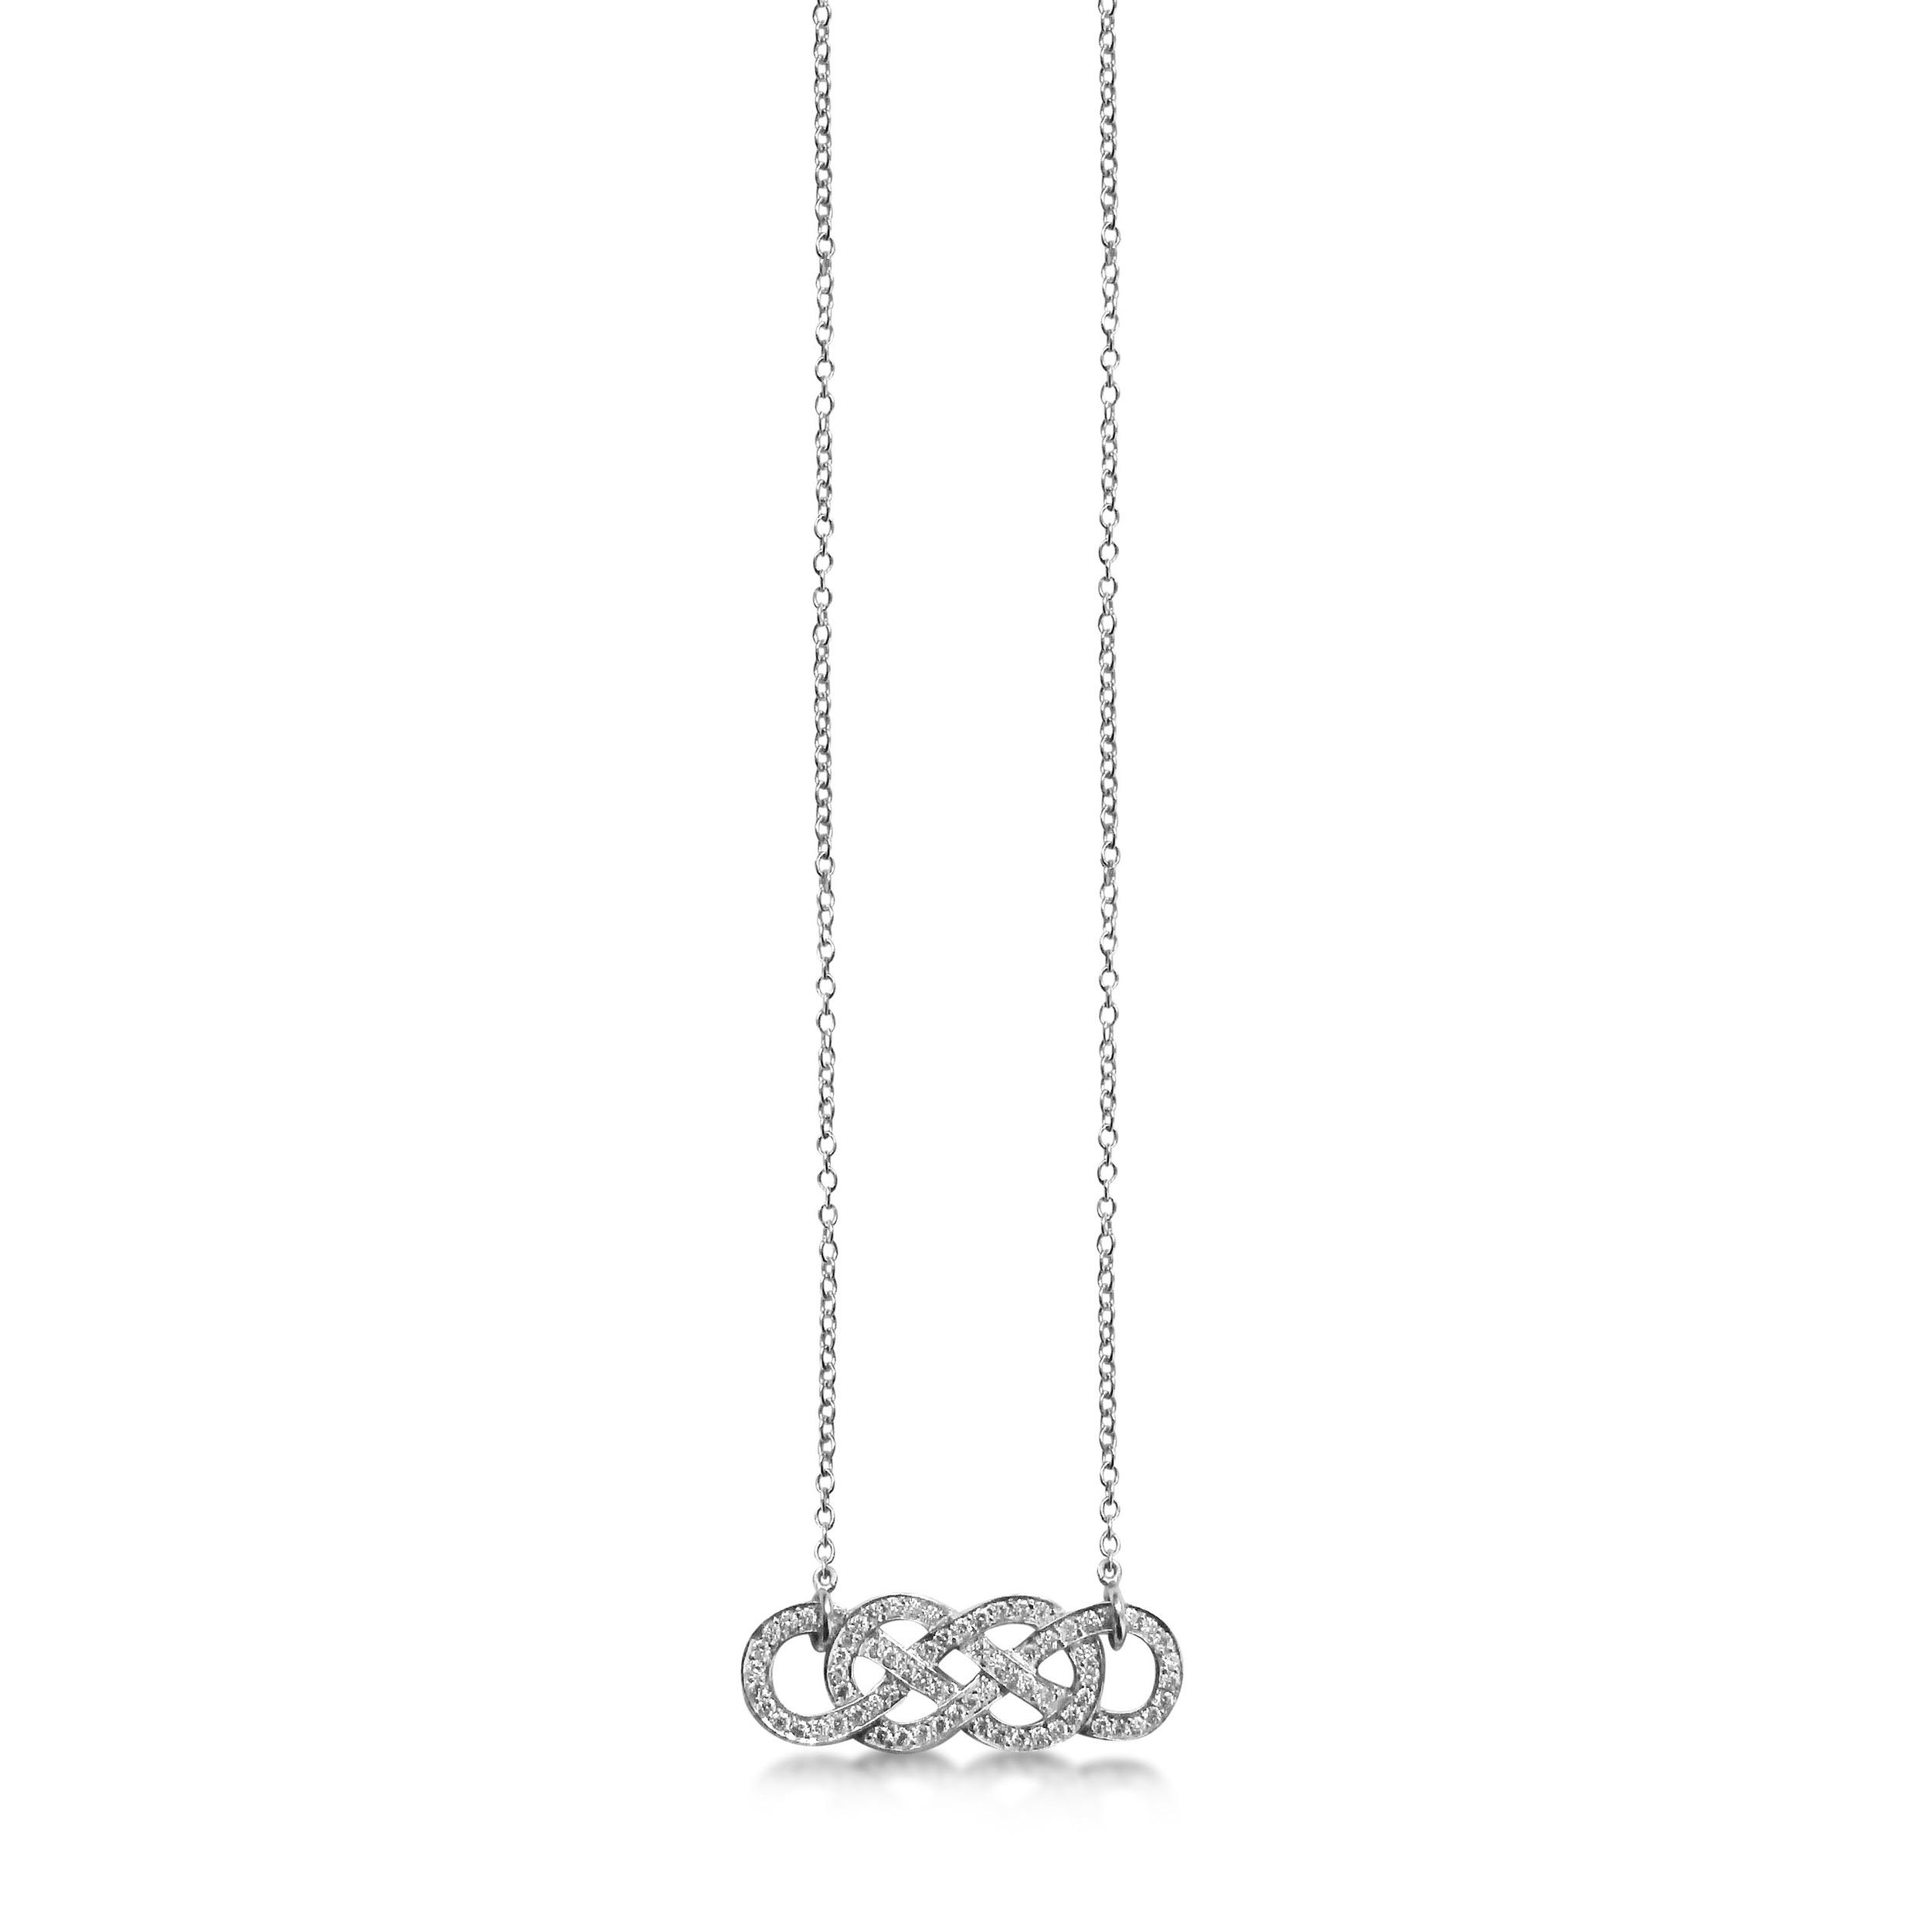 Diamond-double-infinity-pendant-necklace.jpg